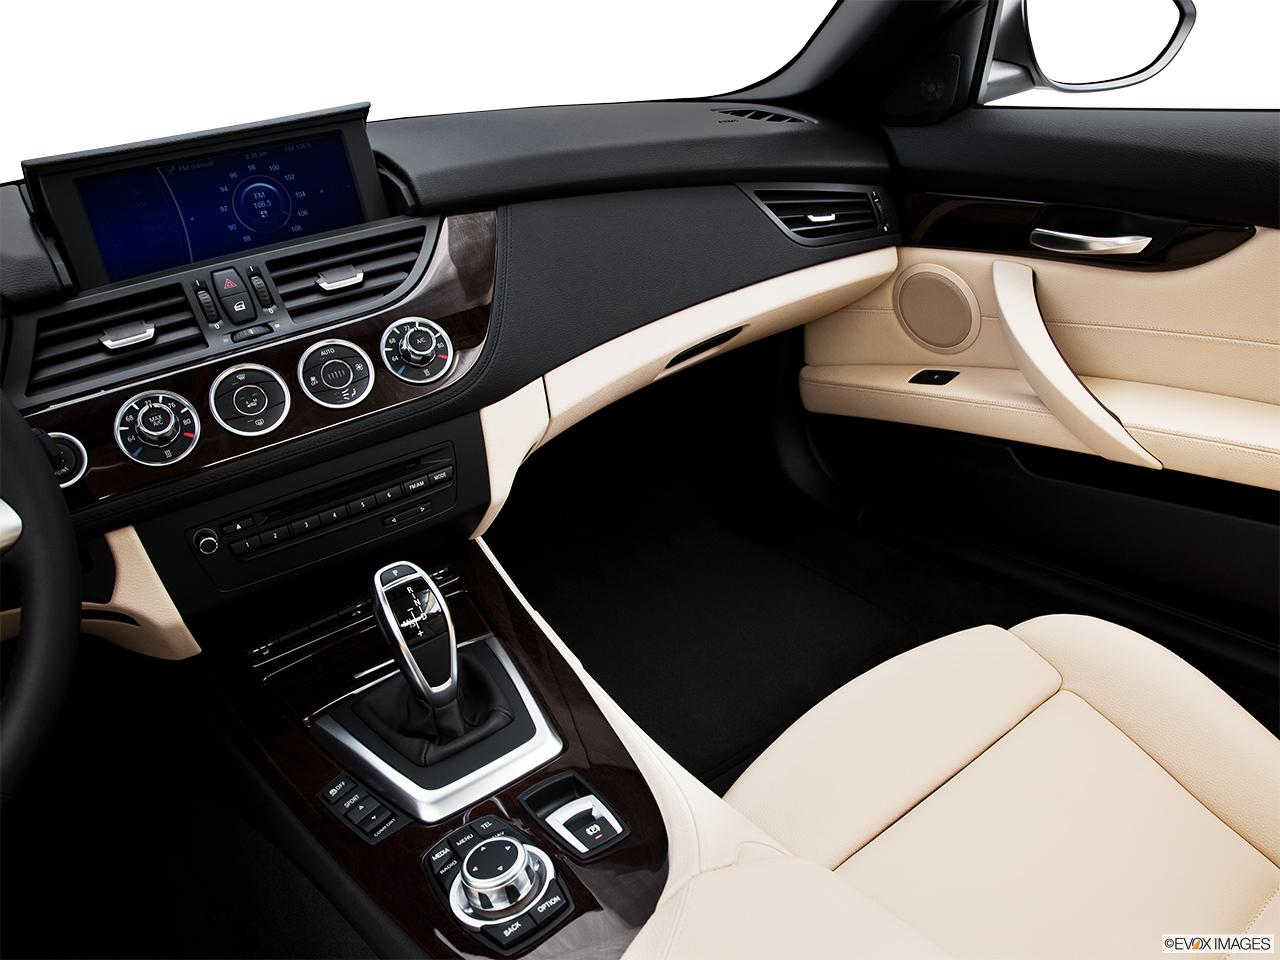 2015 Bmw Z4 Roadster 35i Center Console Passenger Side